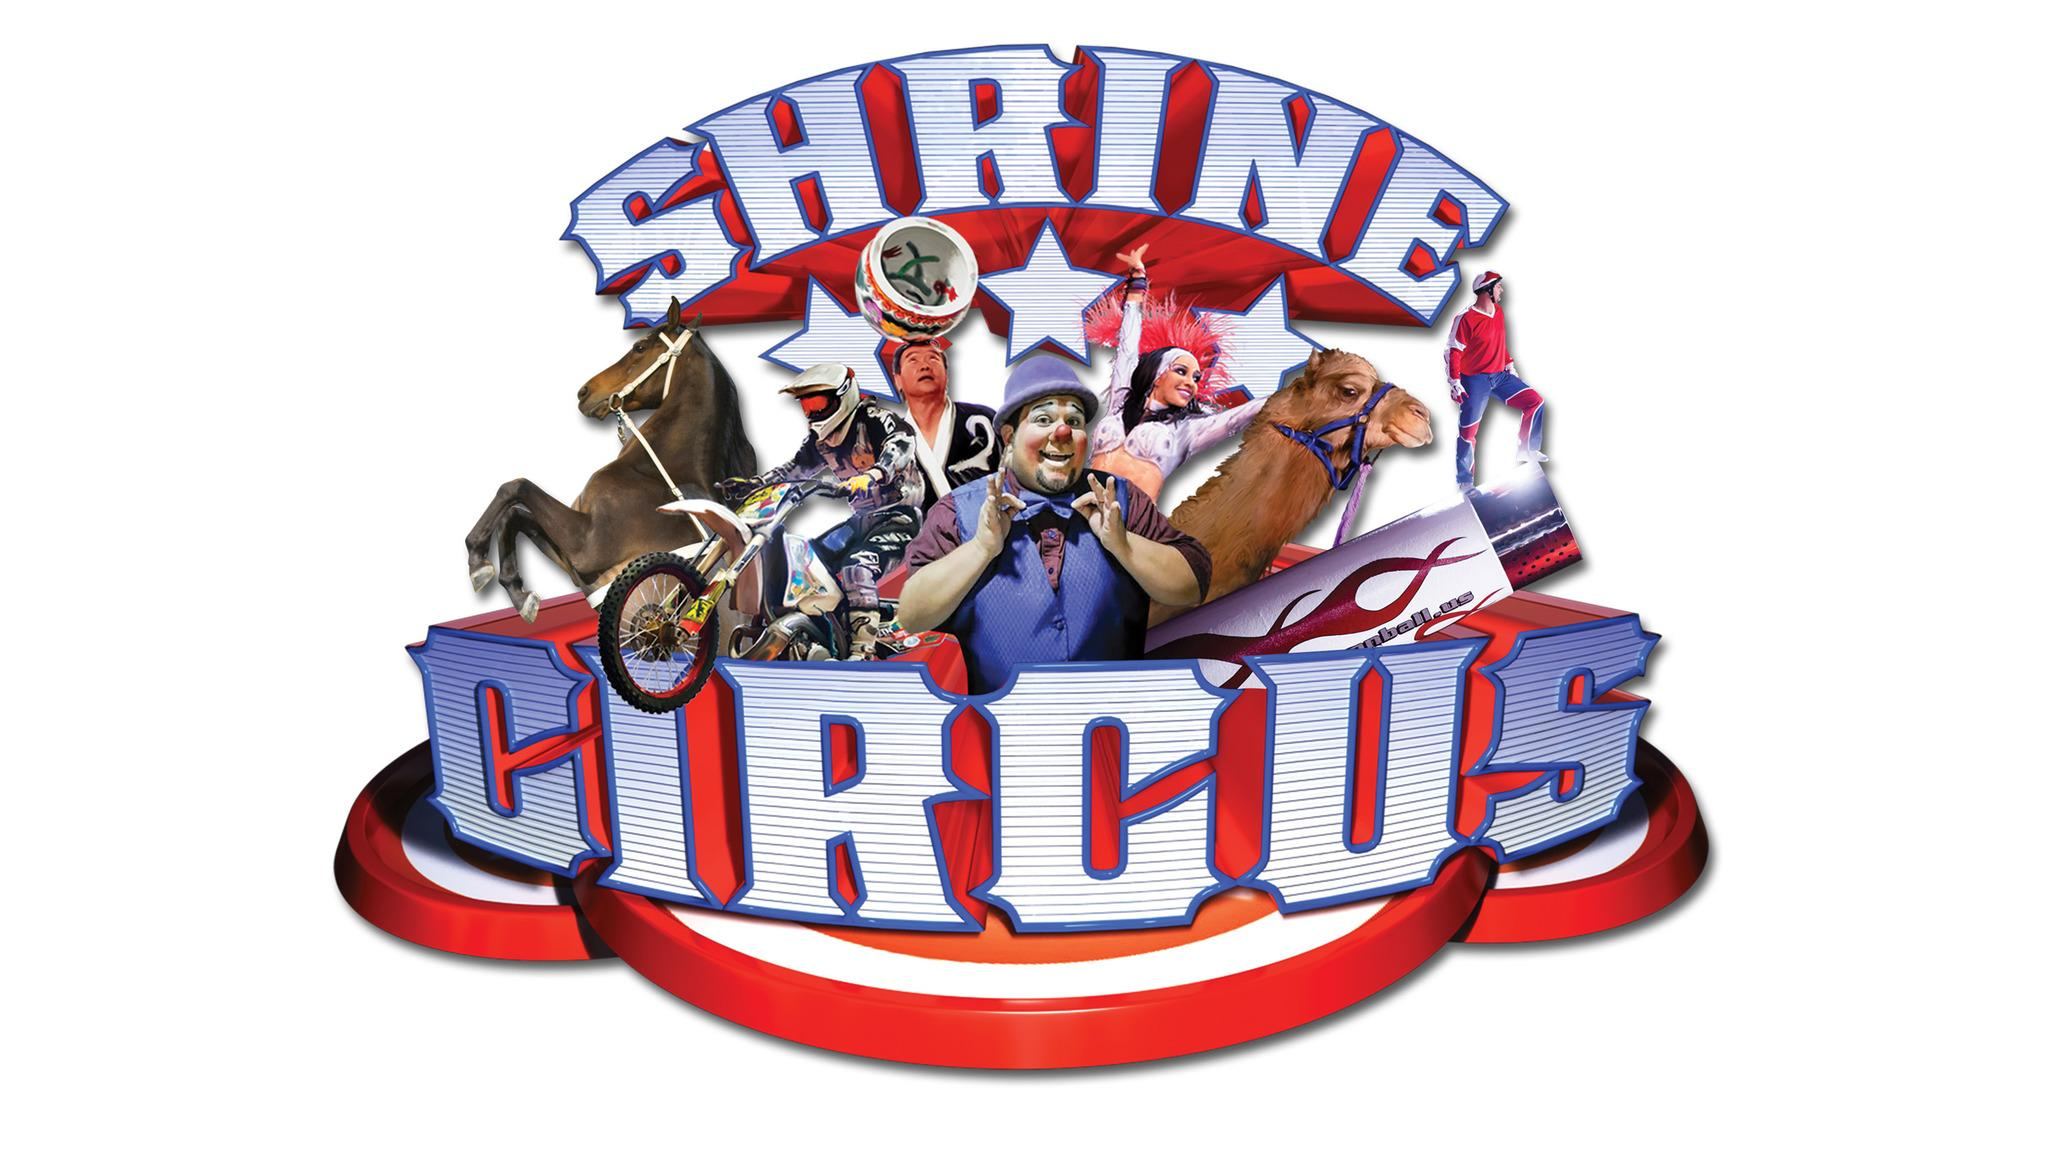 El Karubah Shrine Circus 2016 at CenturyLink Center